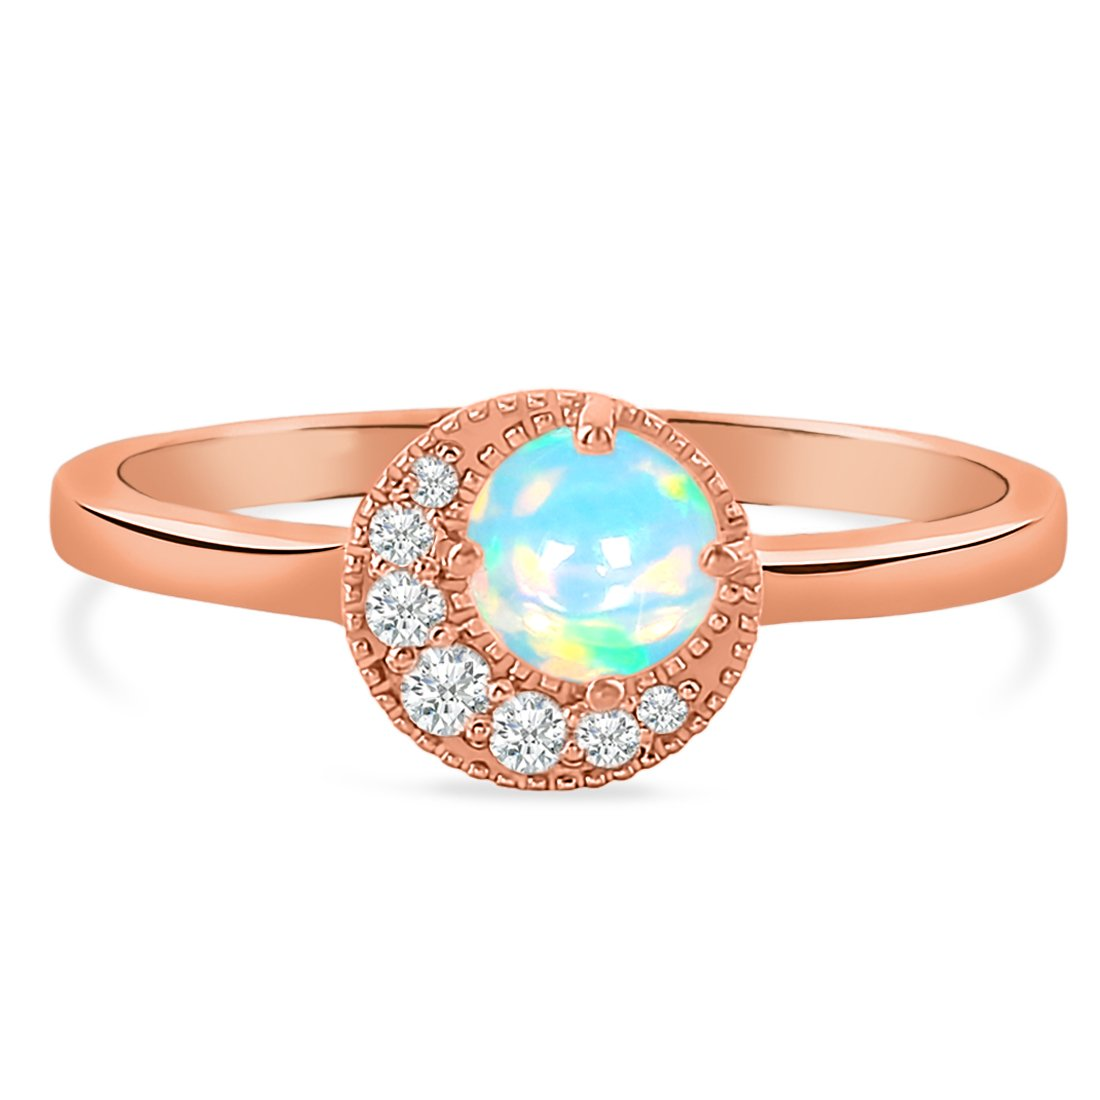 14k Rose Gold Vermeil Opal Ring-Above All